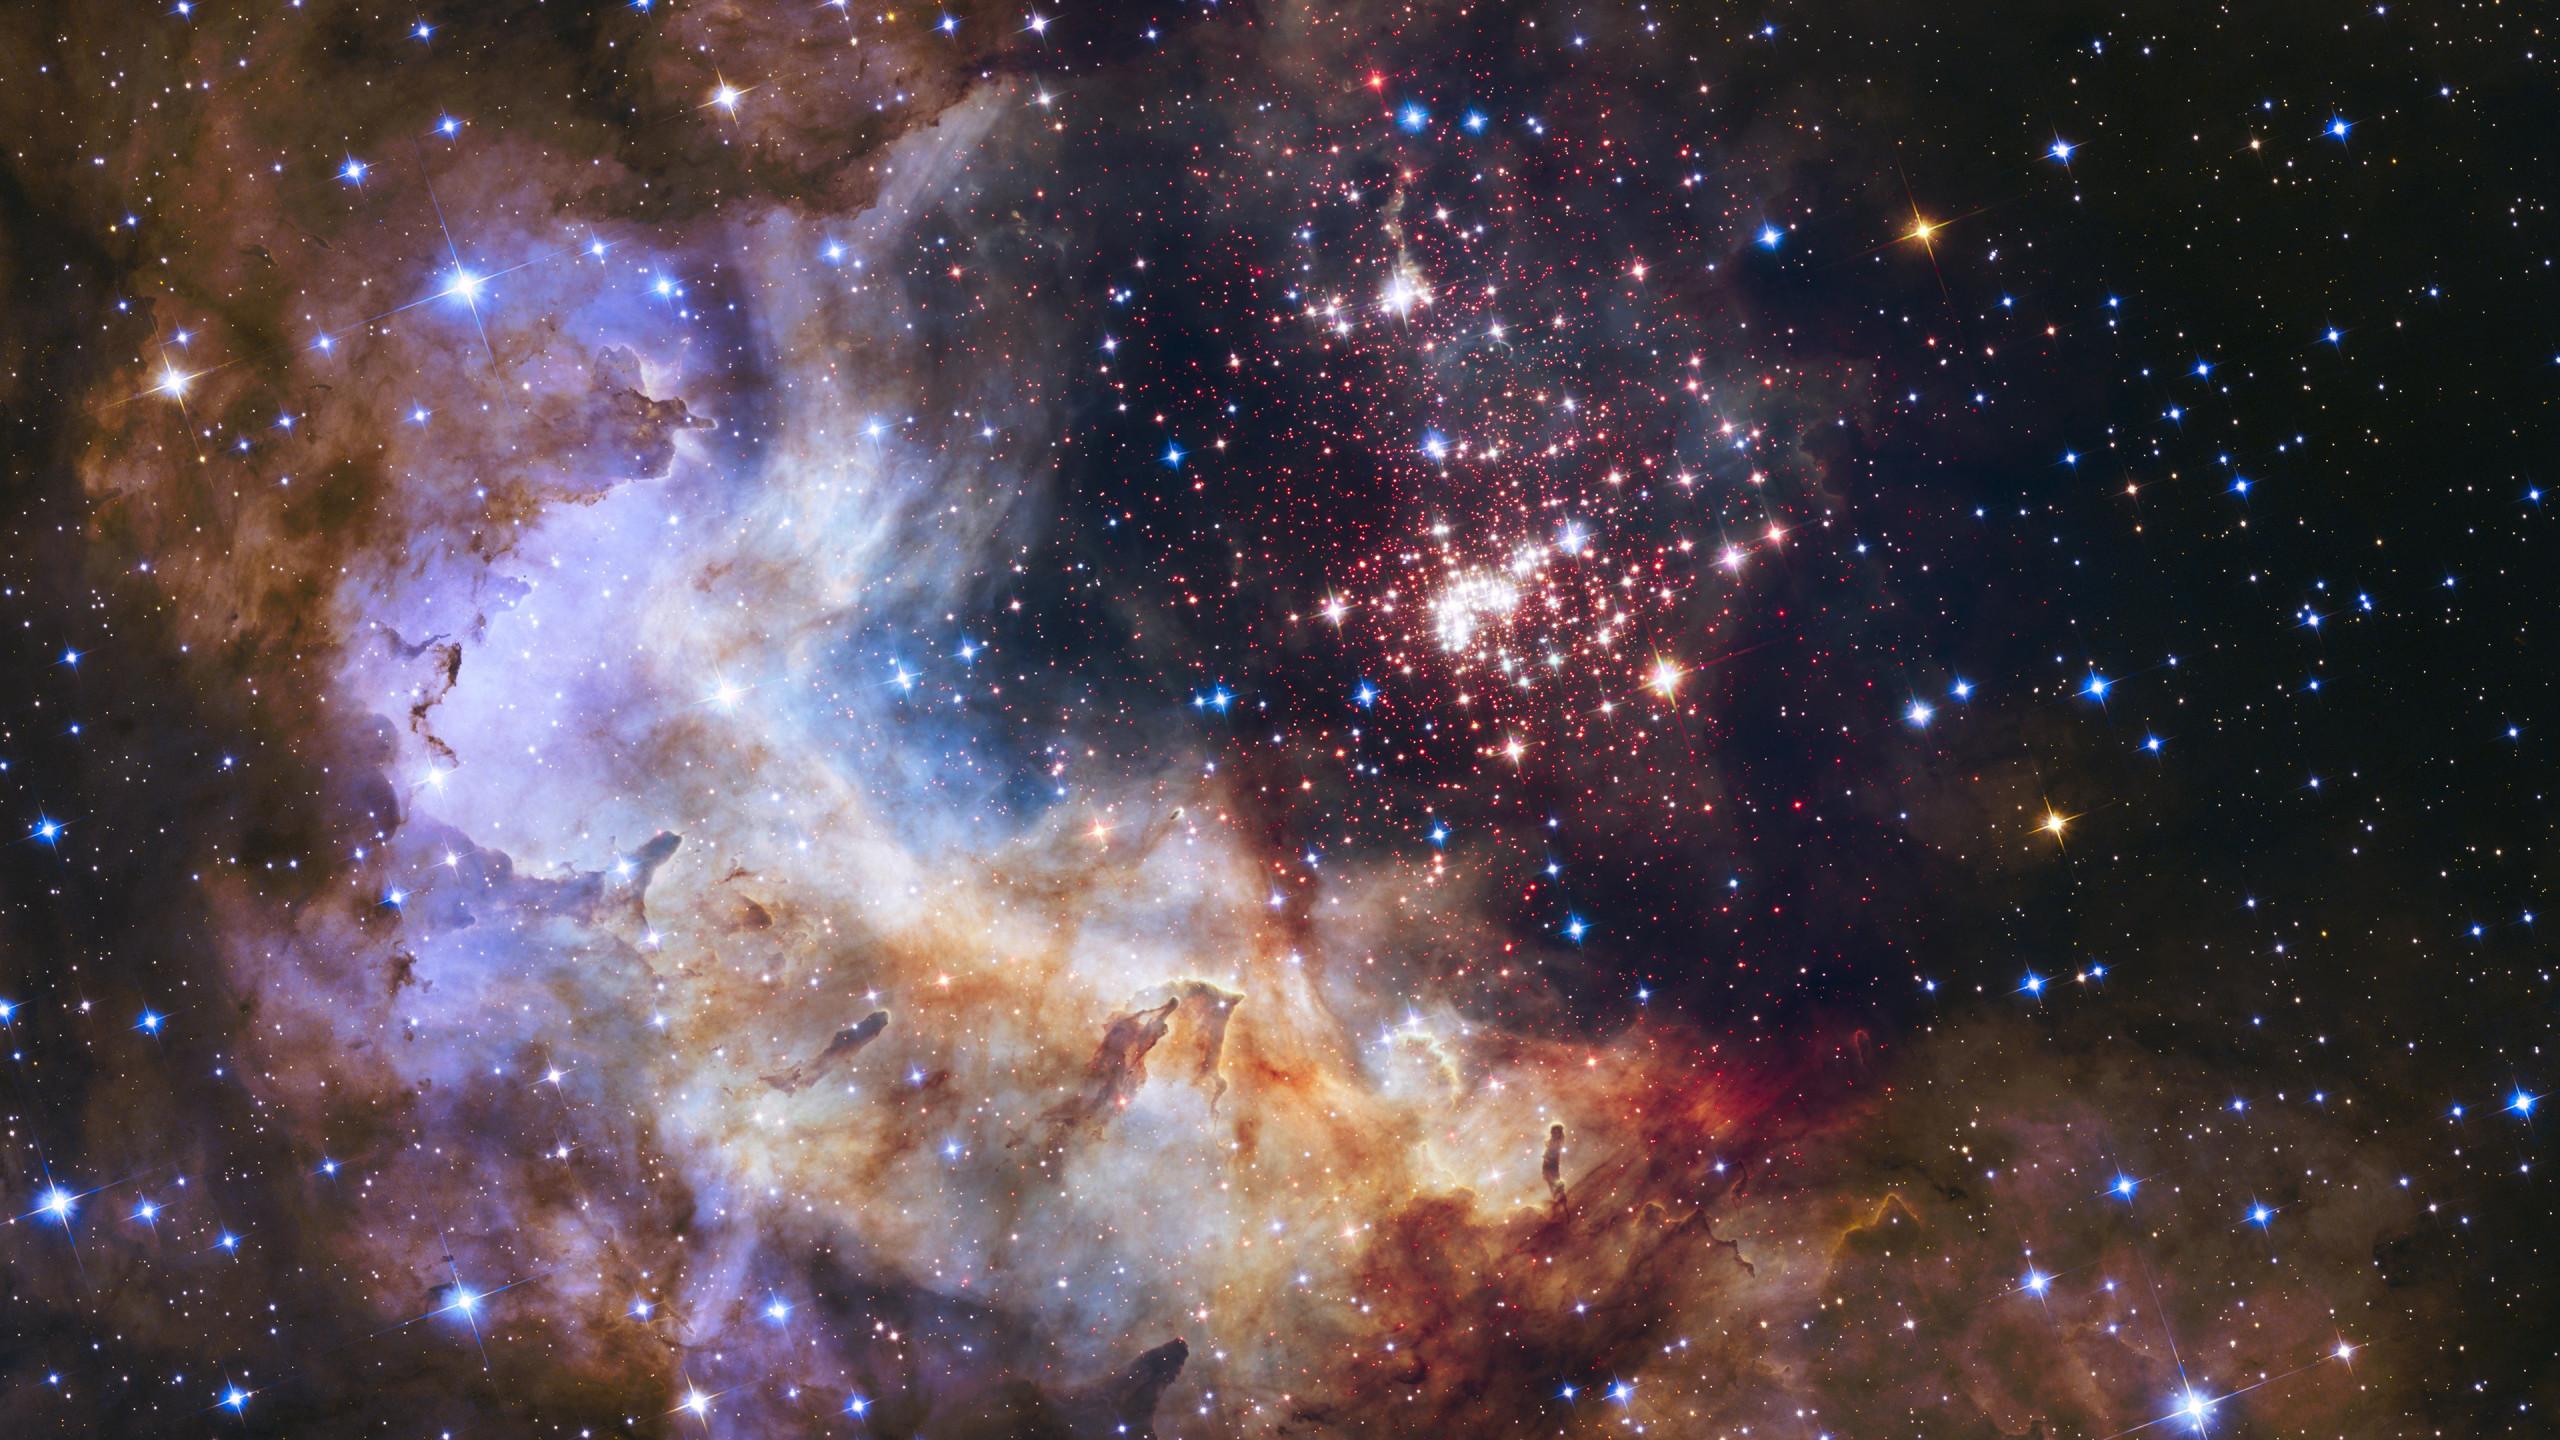 Download Wallpaper Universe Seen Through Hubble Space Telescope 2560x1440